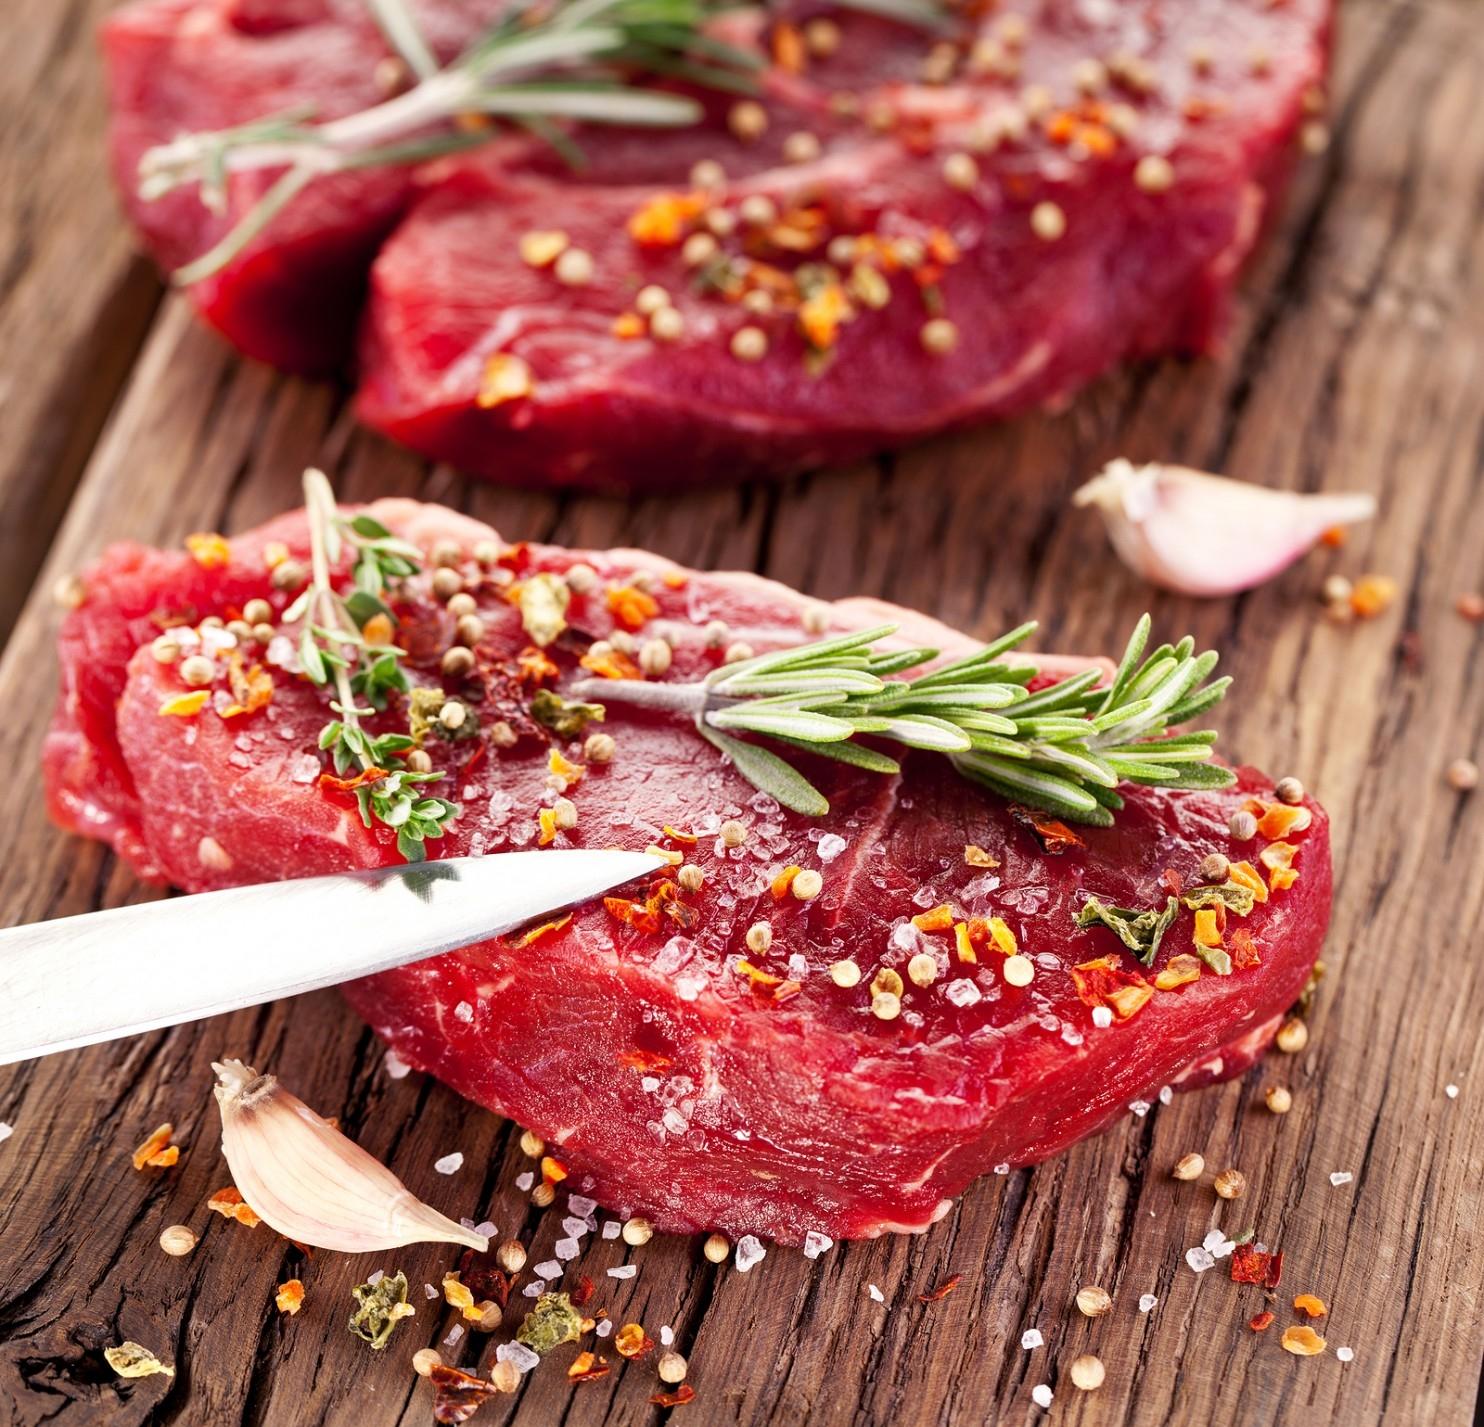 bigstock-Raw-beef-steak-on-a-dark-woode-44856208.jpg